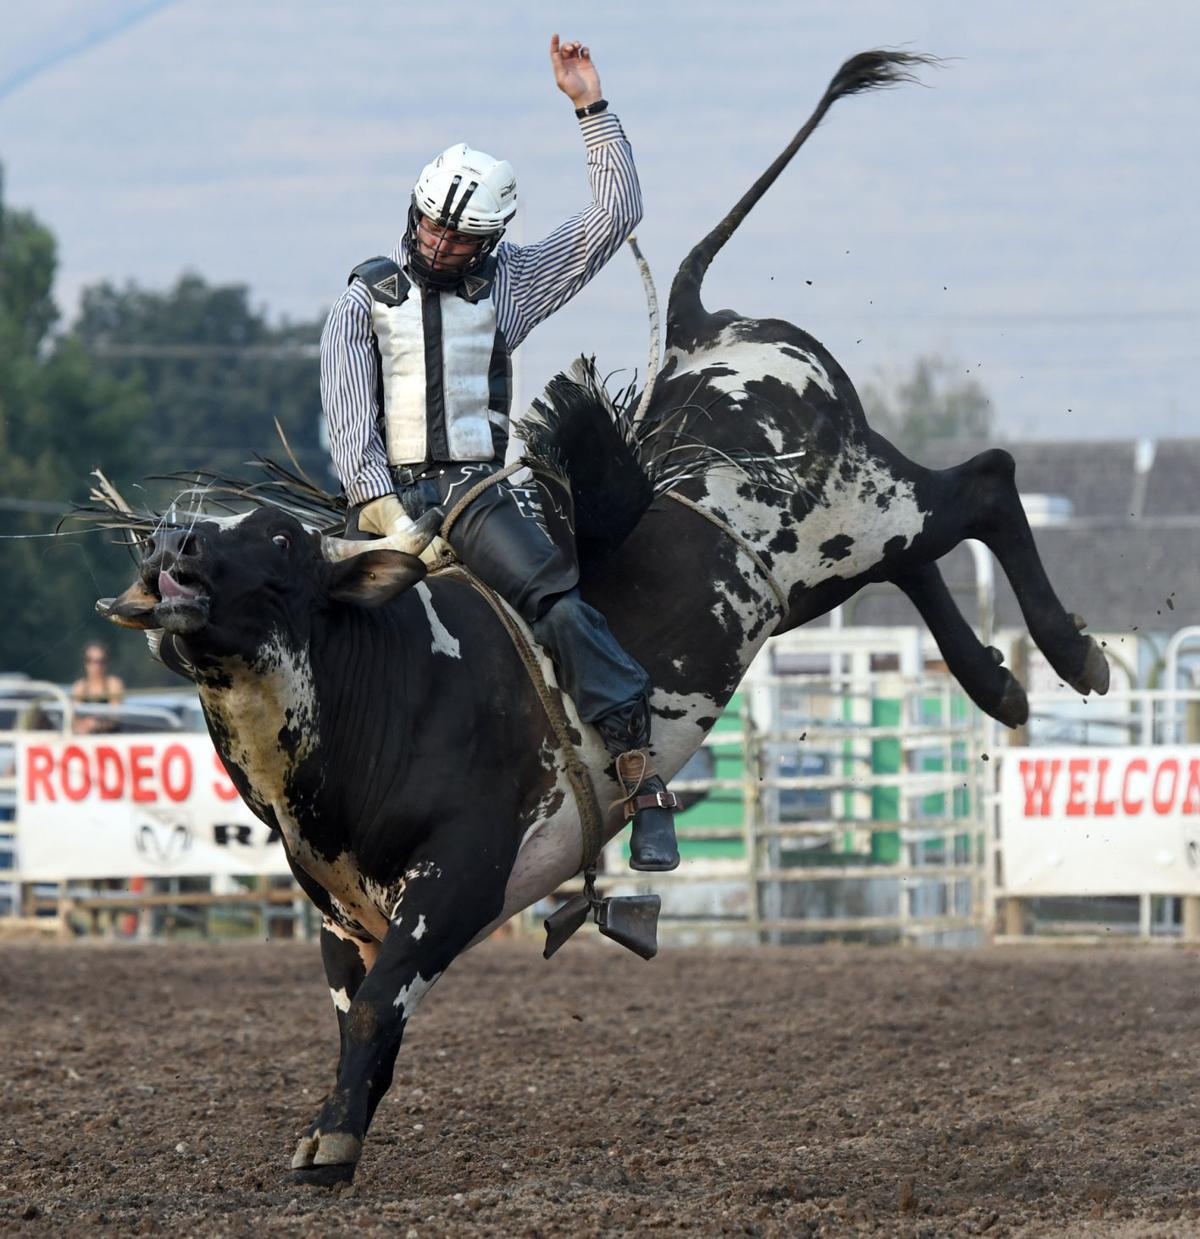 081017 bull riding gallery4.jpg